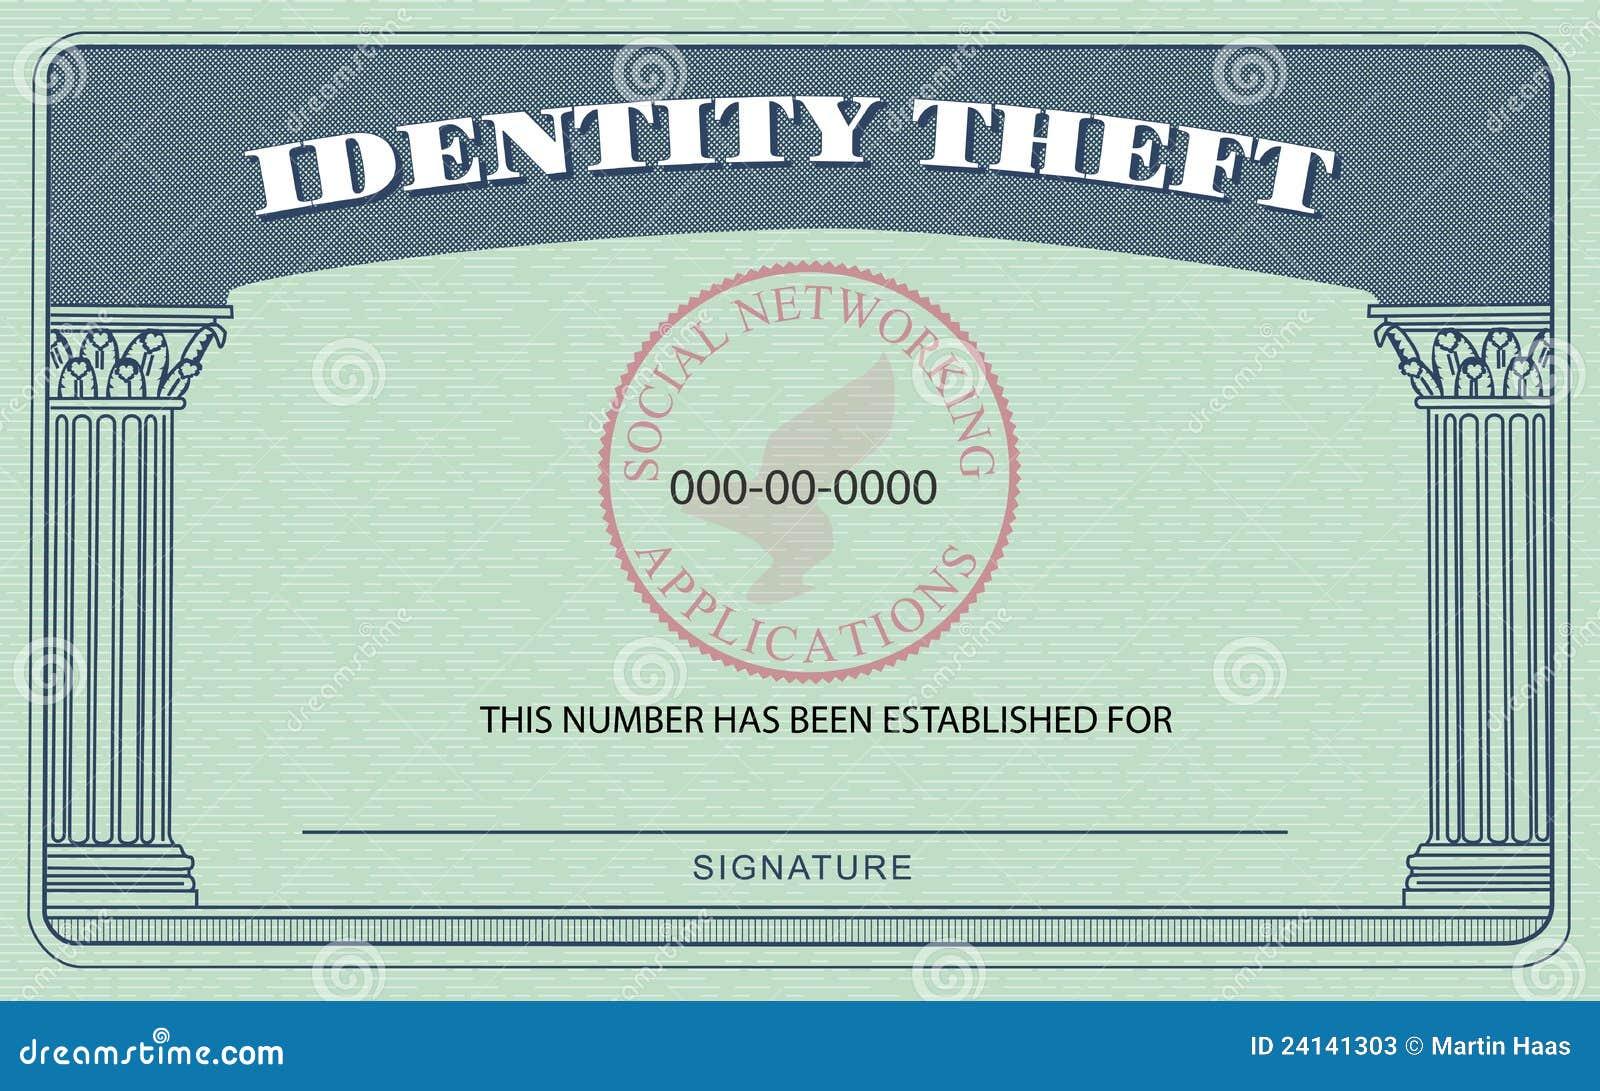 Identity Theft Card stock illustration. Illustration of bogus Regarding Fake Social Security Card Template Download